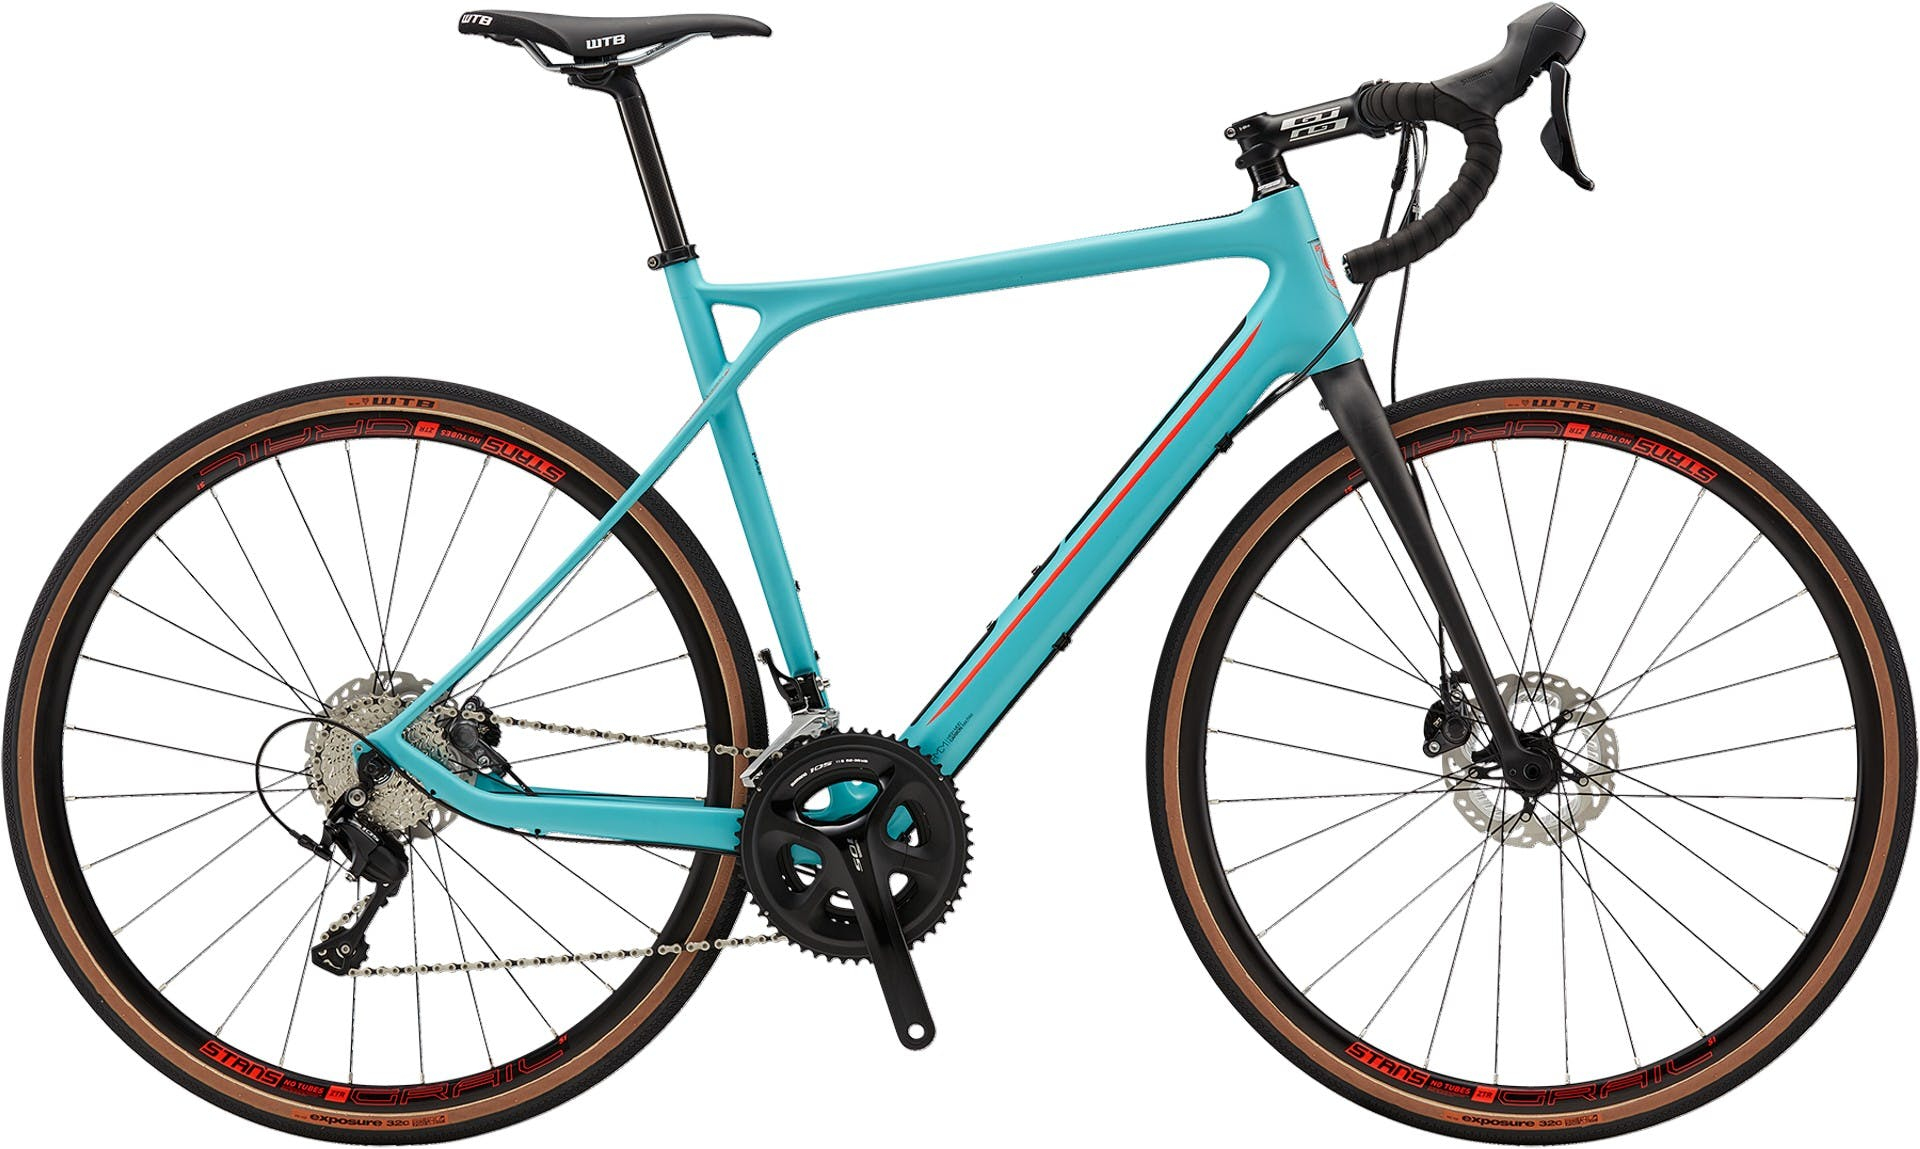 GT Grade X bici gravel